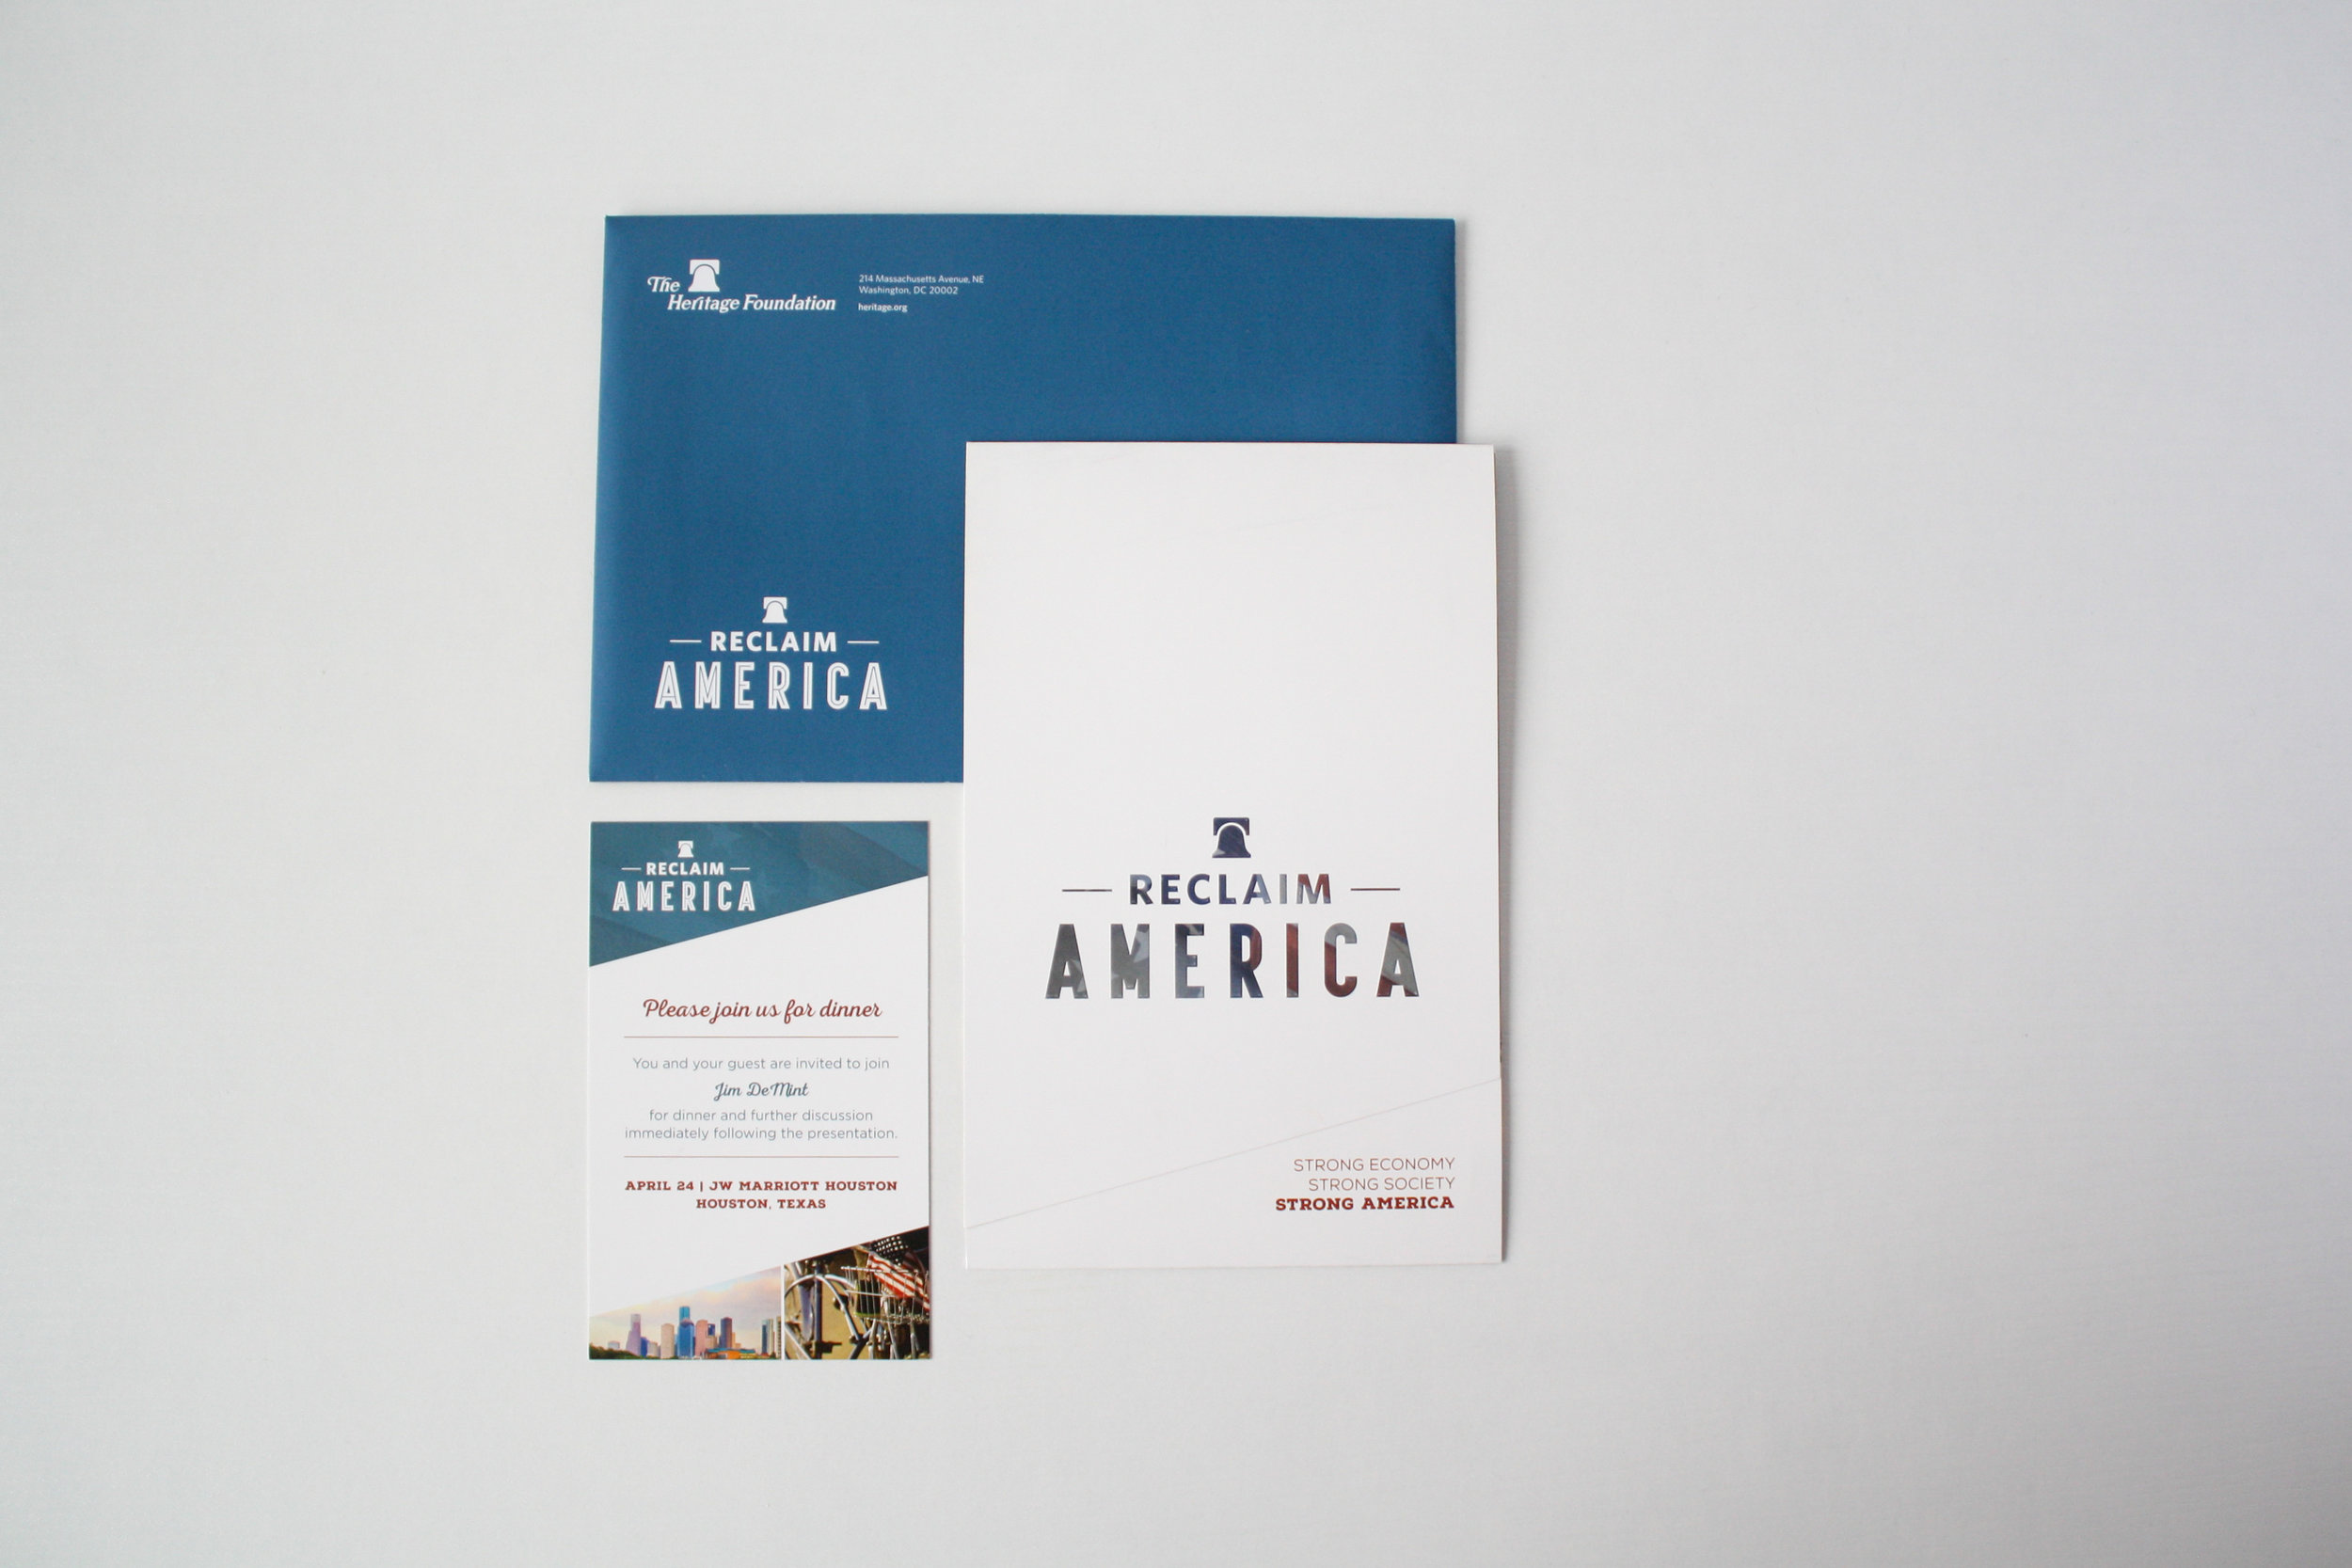 Reclaim America Campaign | Corporate Event Invitation | Casi Long Design | casilong.com:portfolio | #casilongdesign #fearlesspursuit 1.jpg